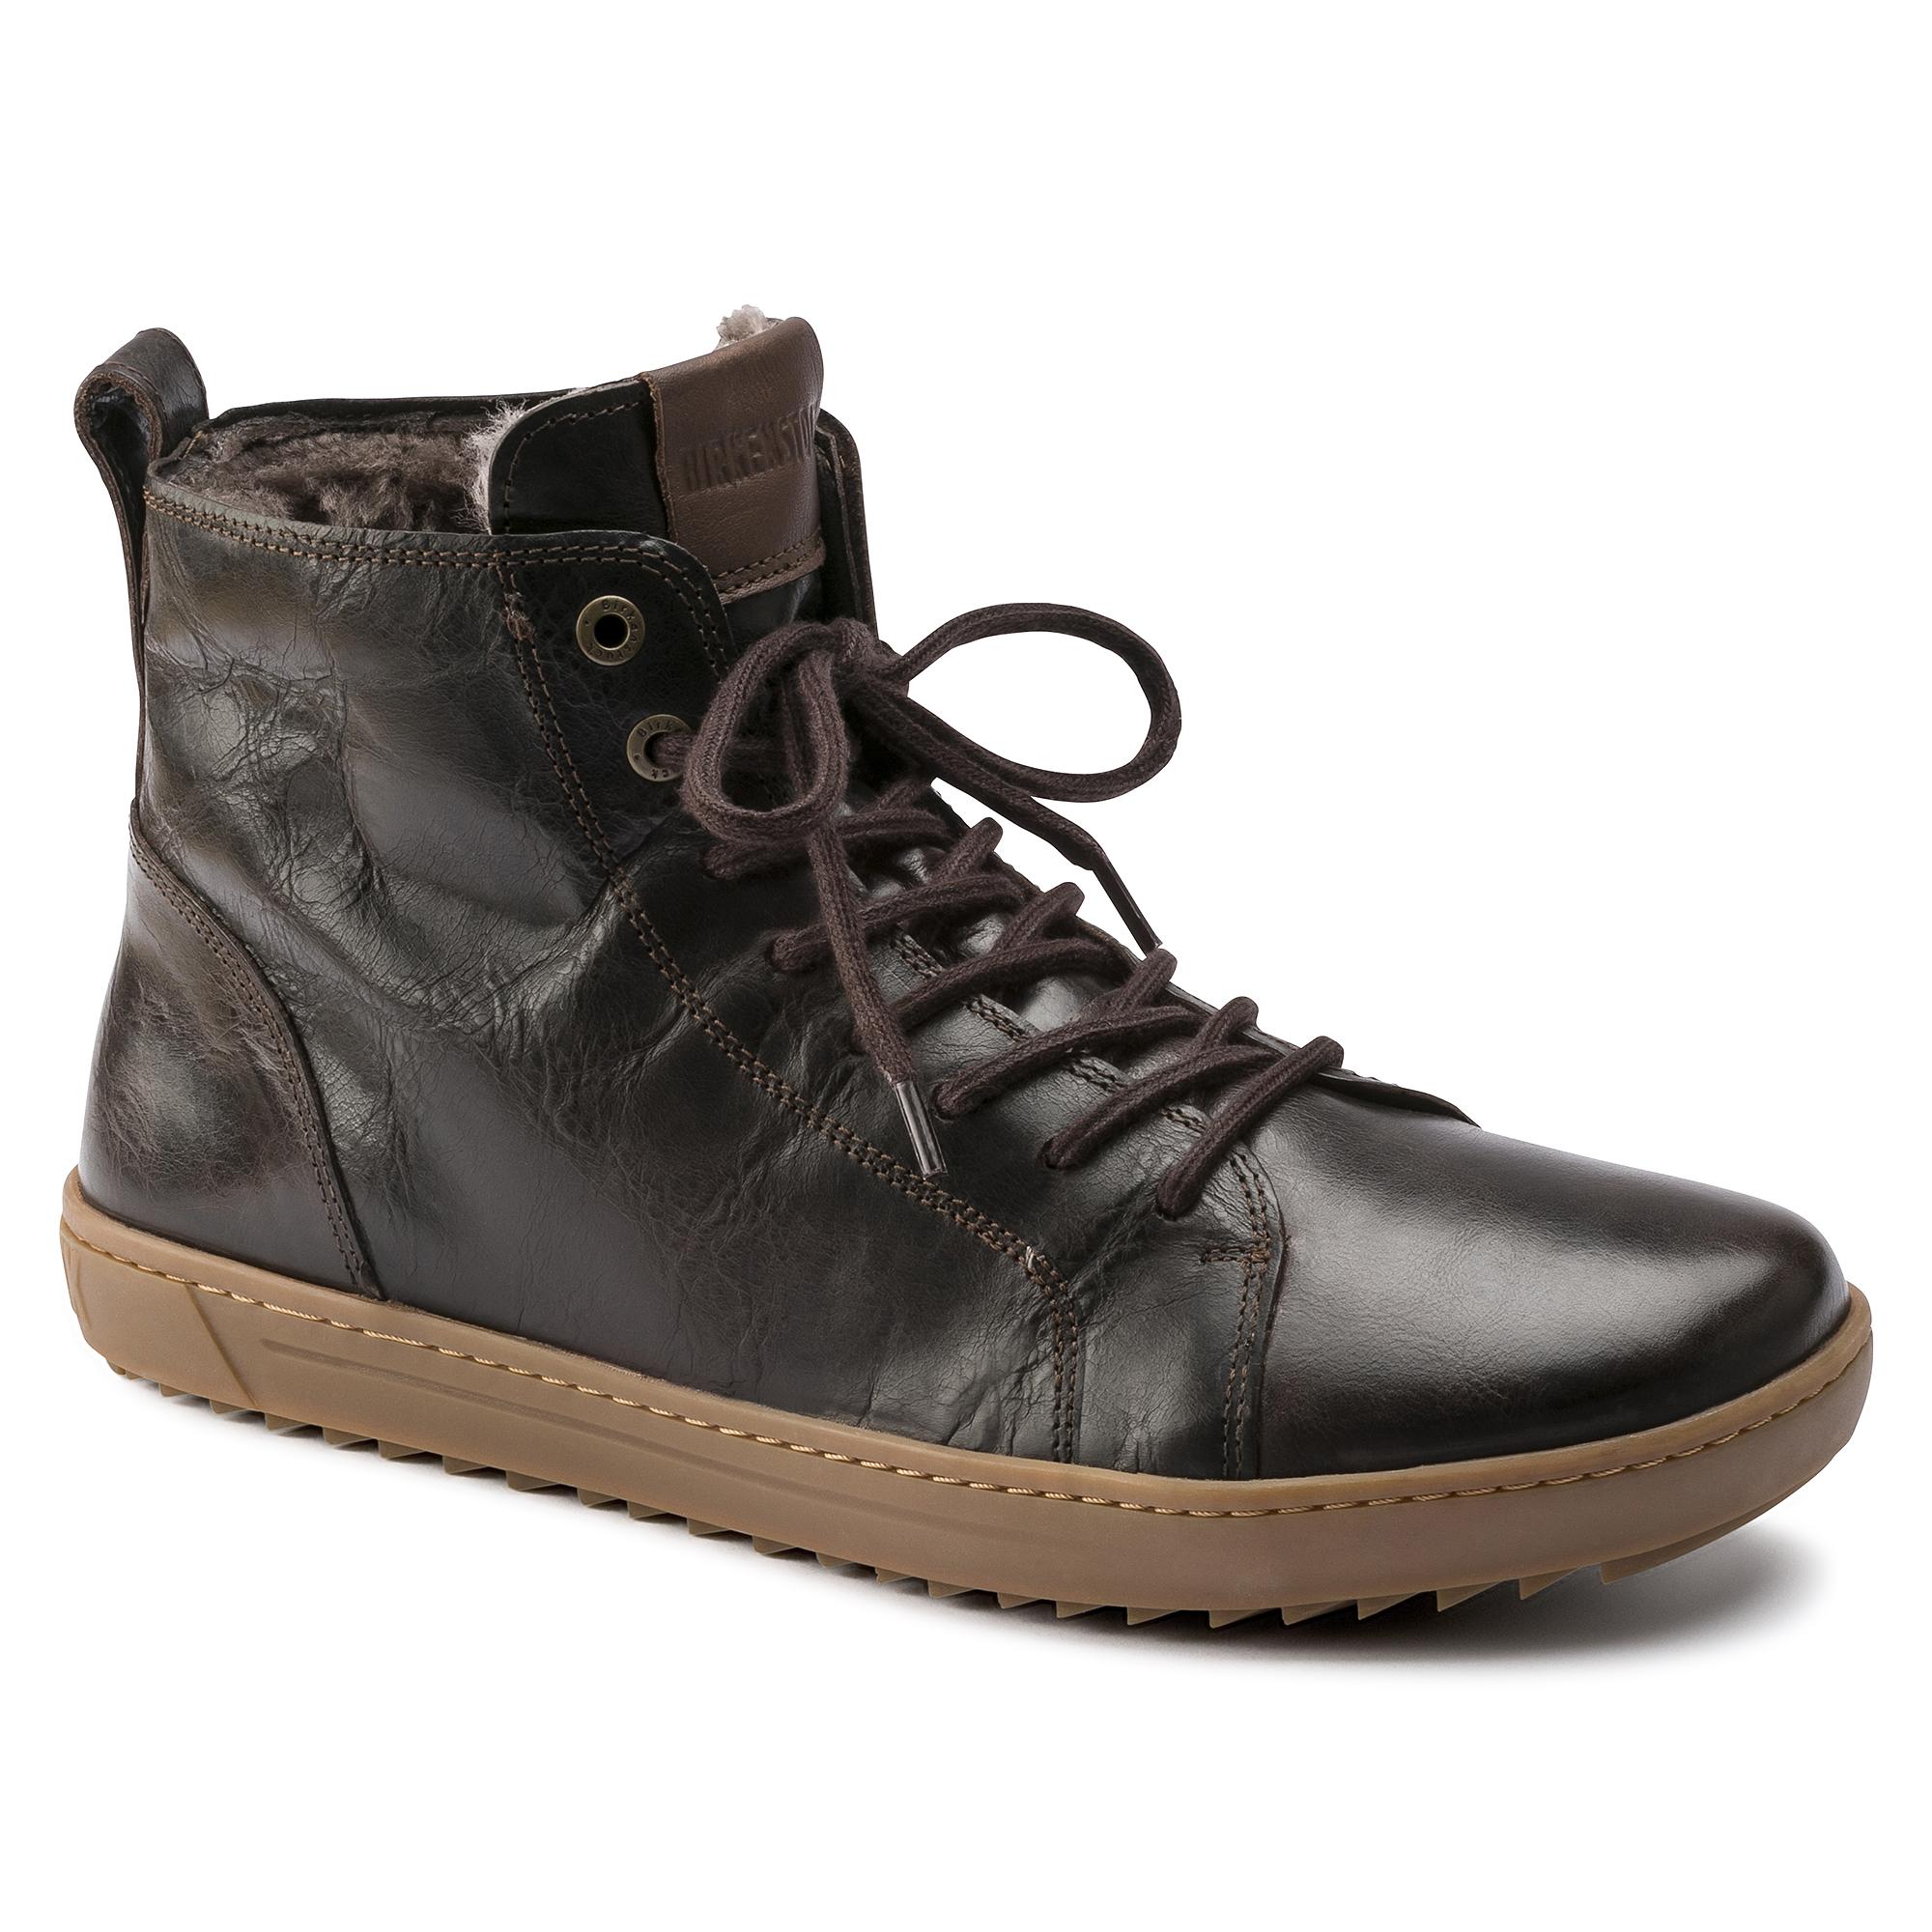 Bartlett Natural Leather Mocha